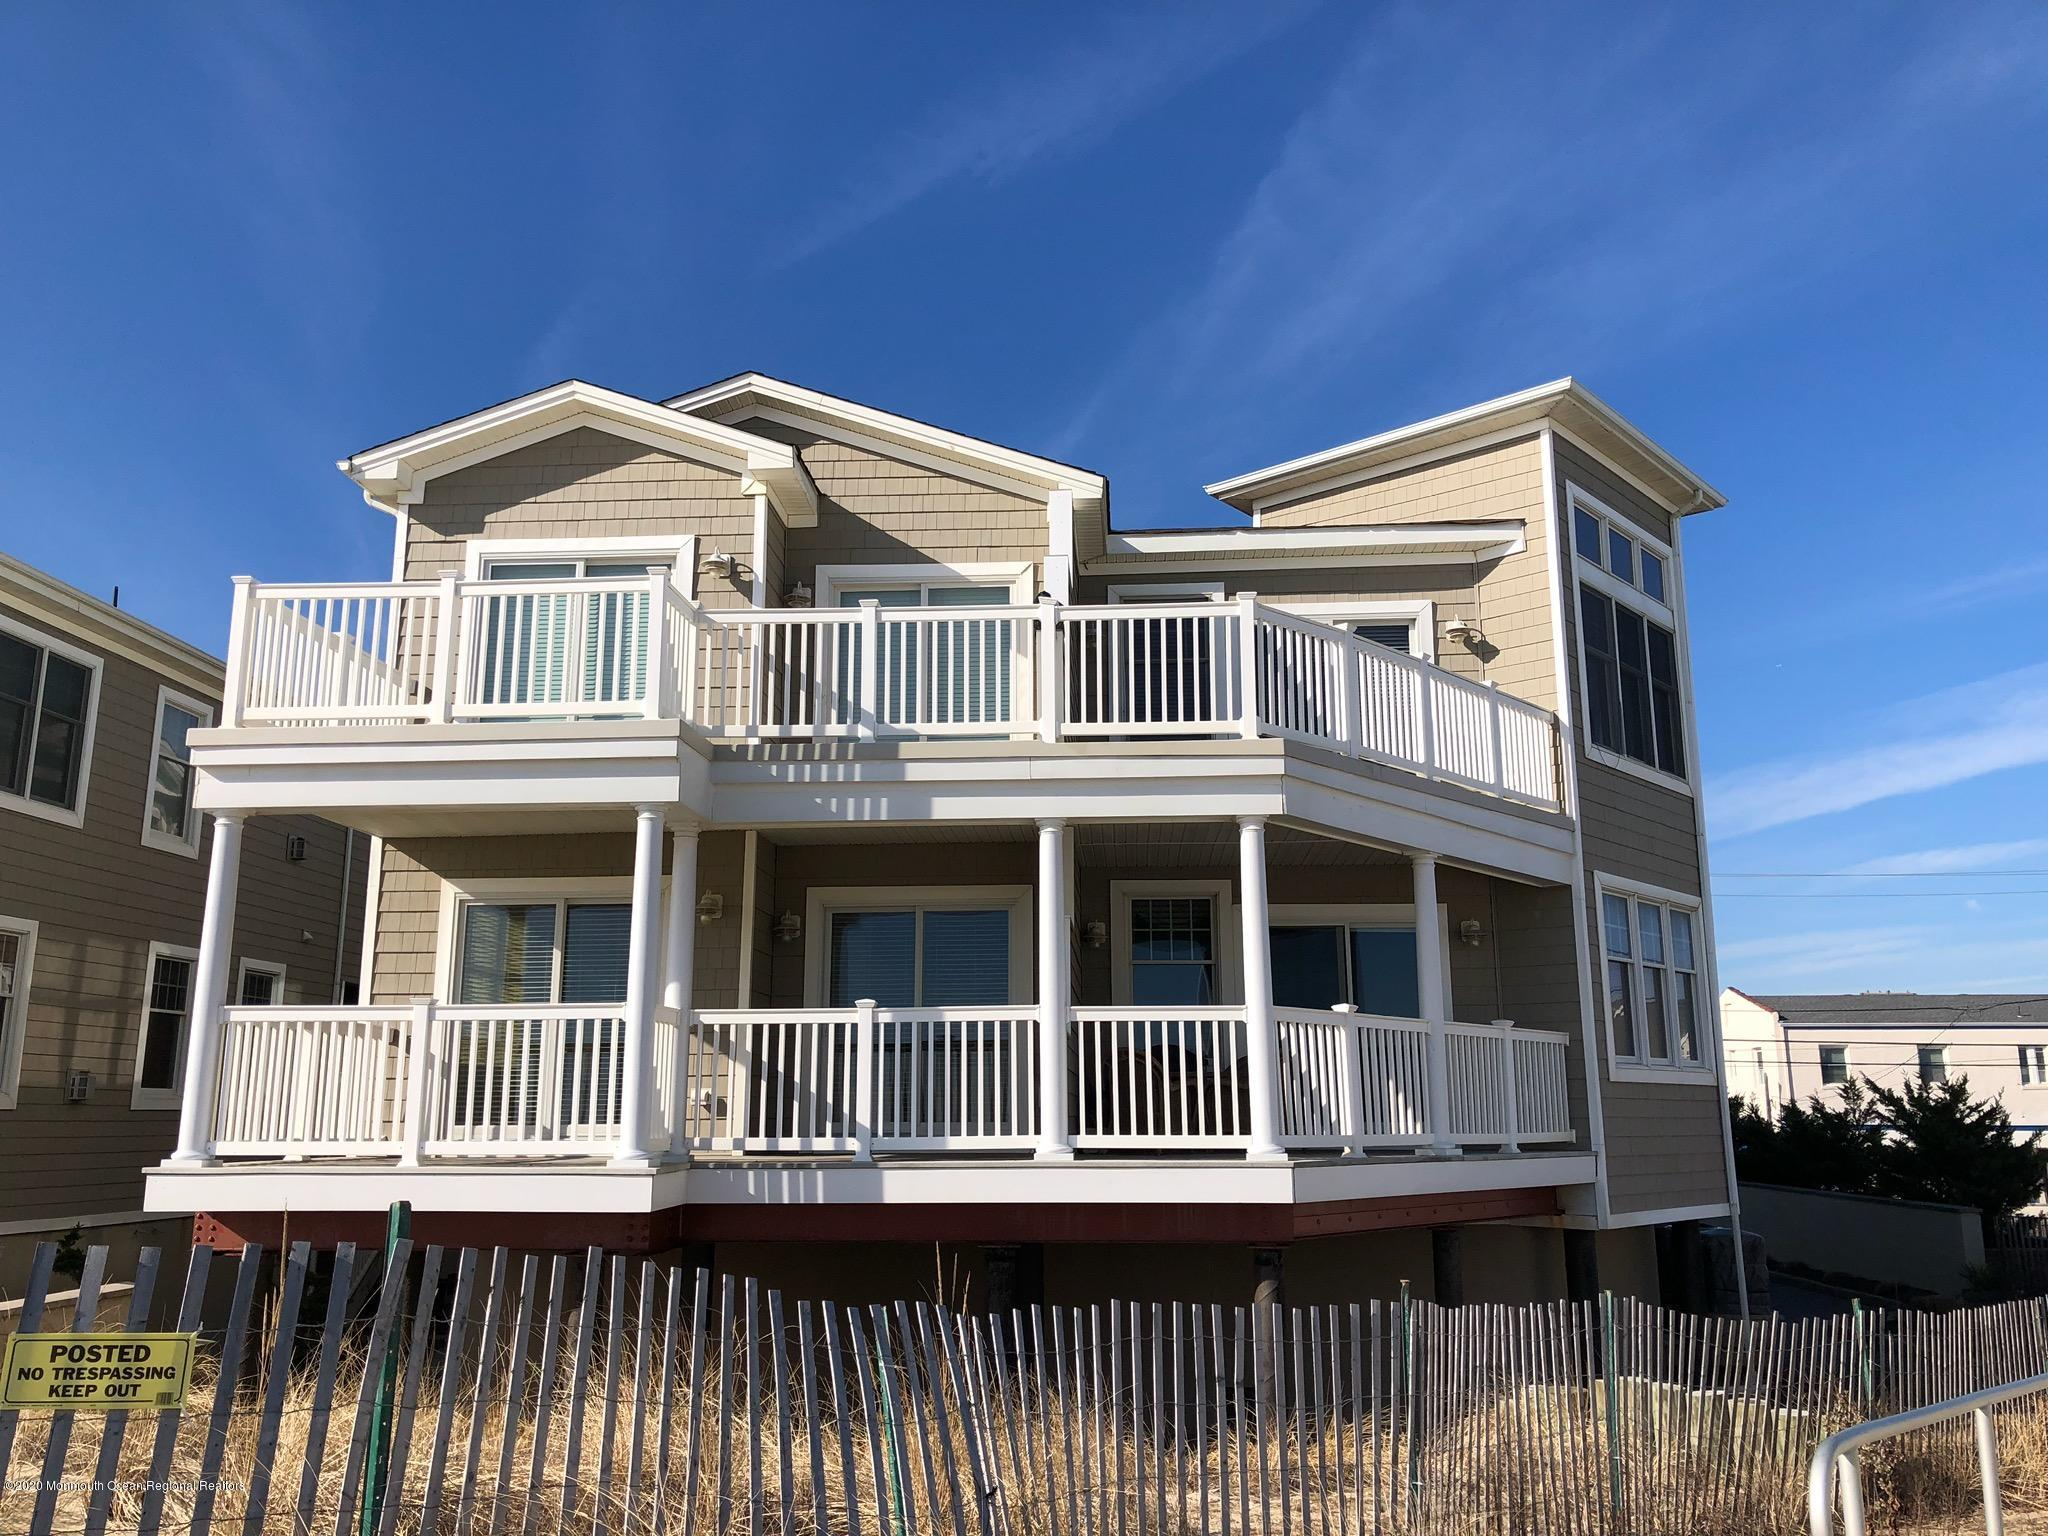 209 Beachfront # 1, Manasquan, NJ 08736